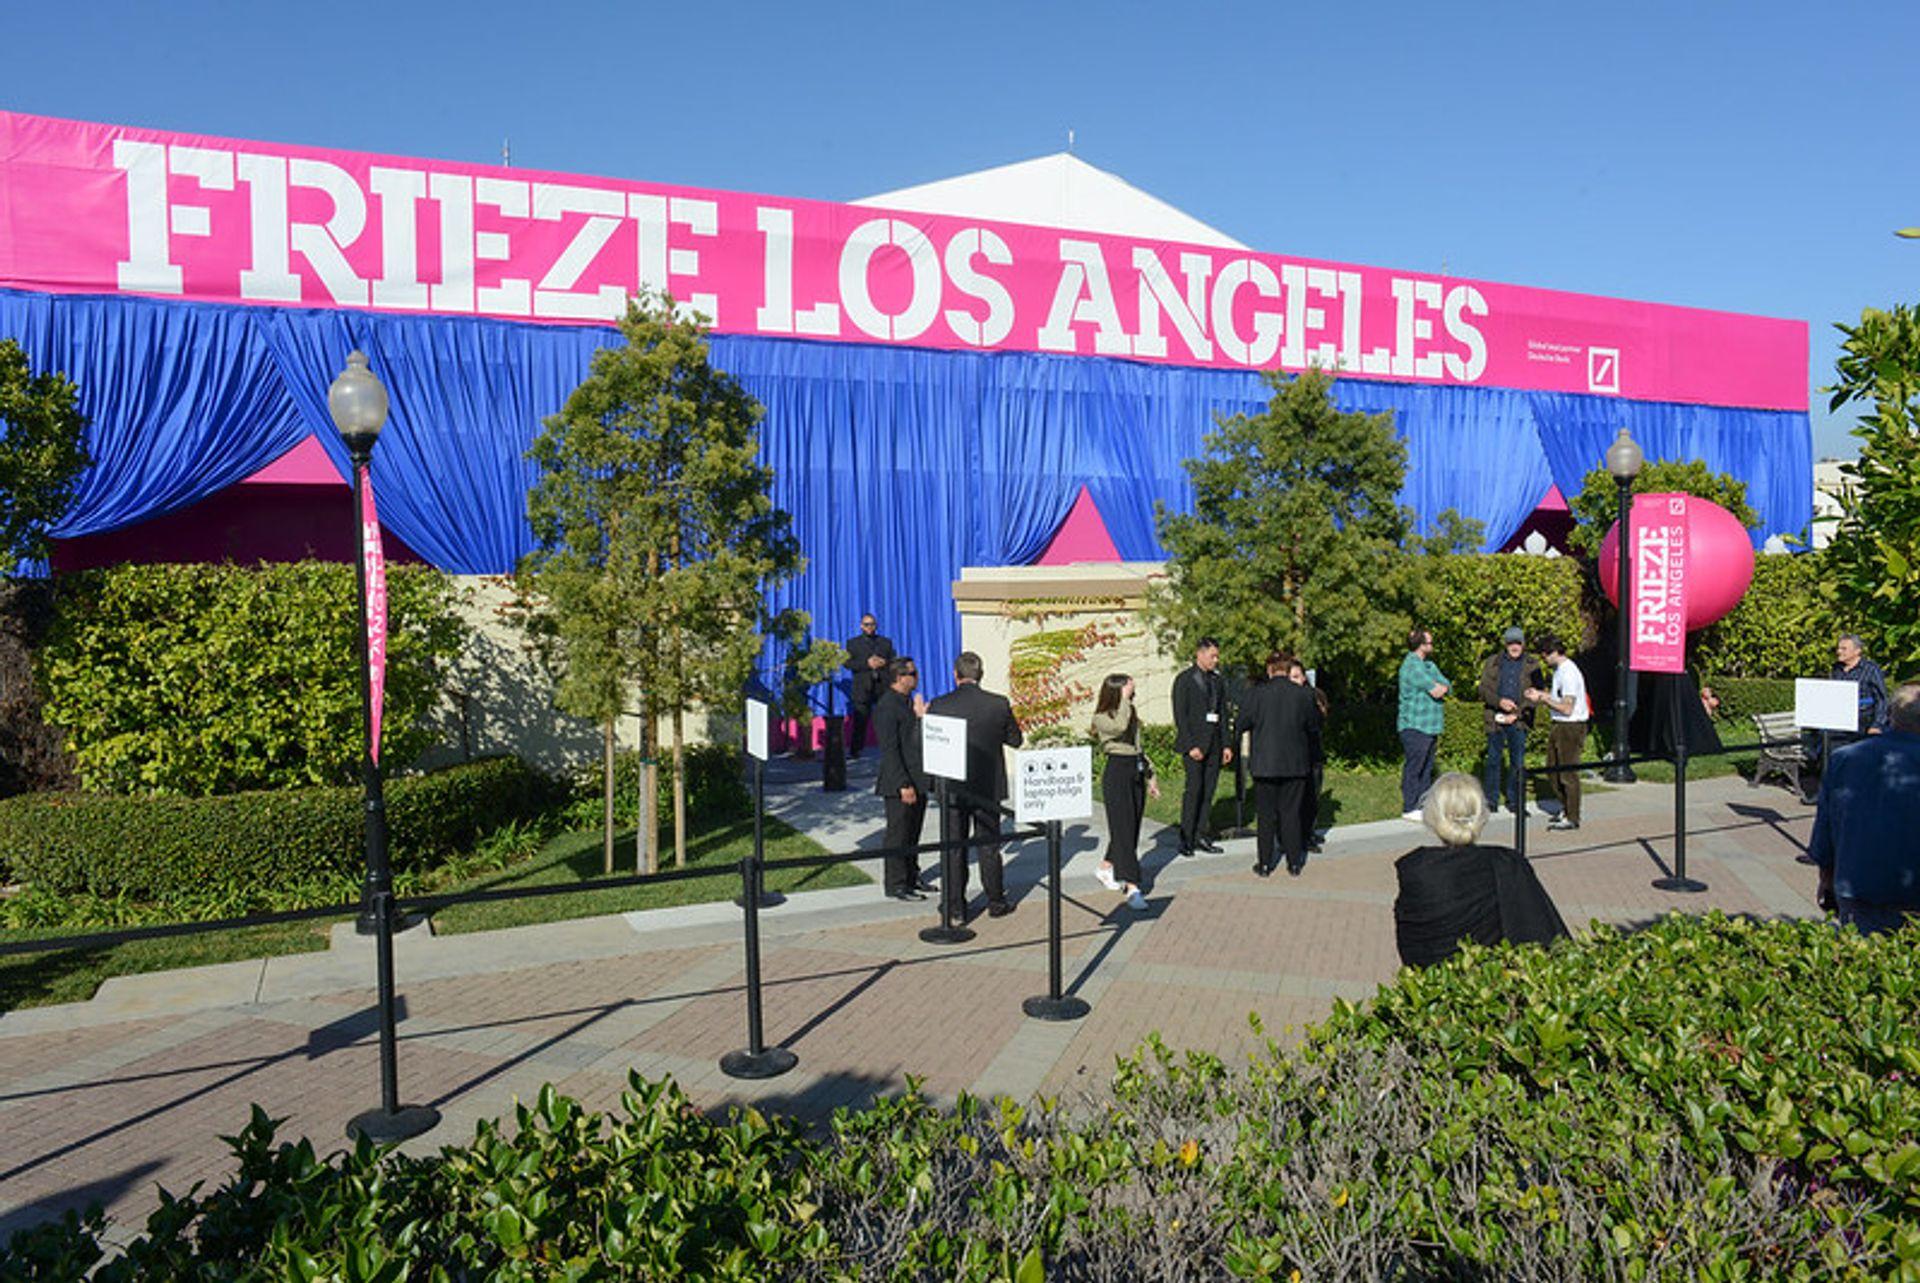 Frieze Los Angeles last ran in February 2020 Courtesy of Frieze